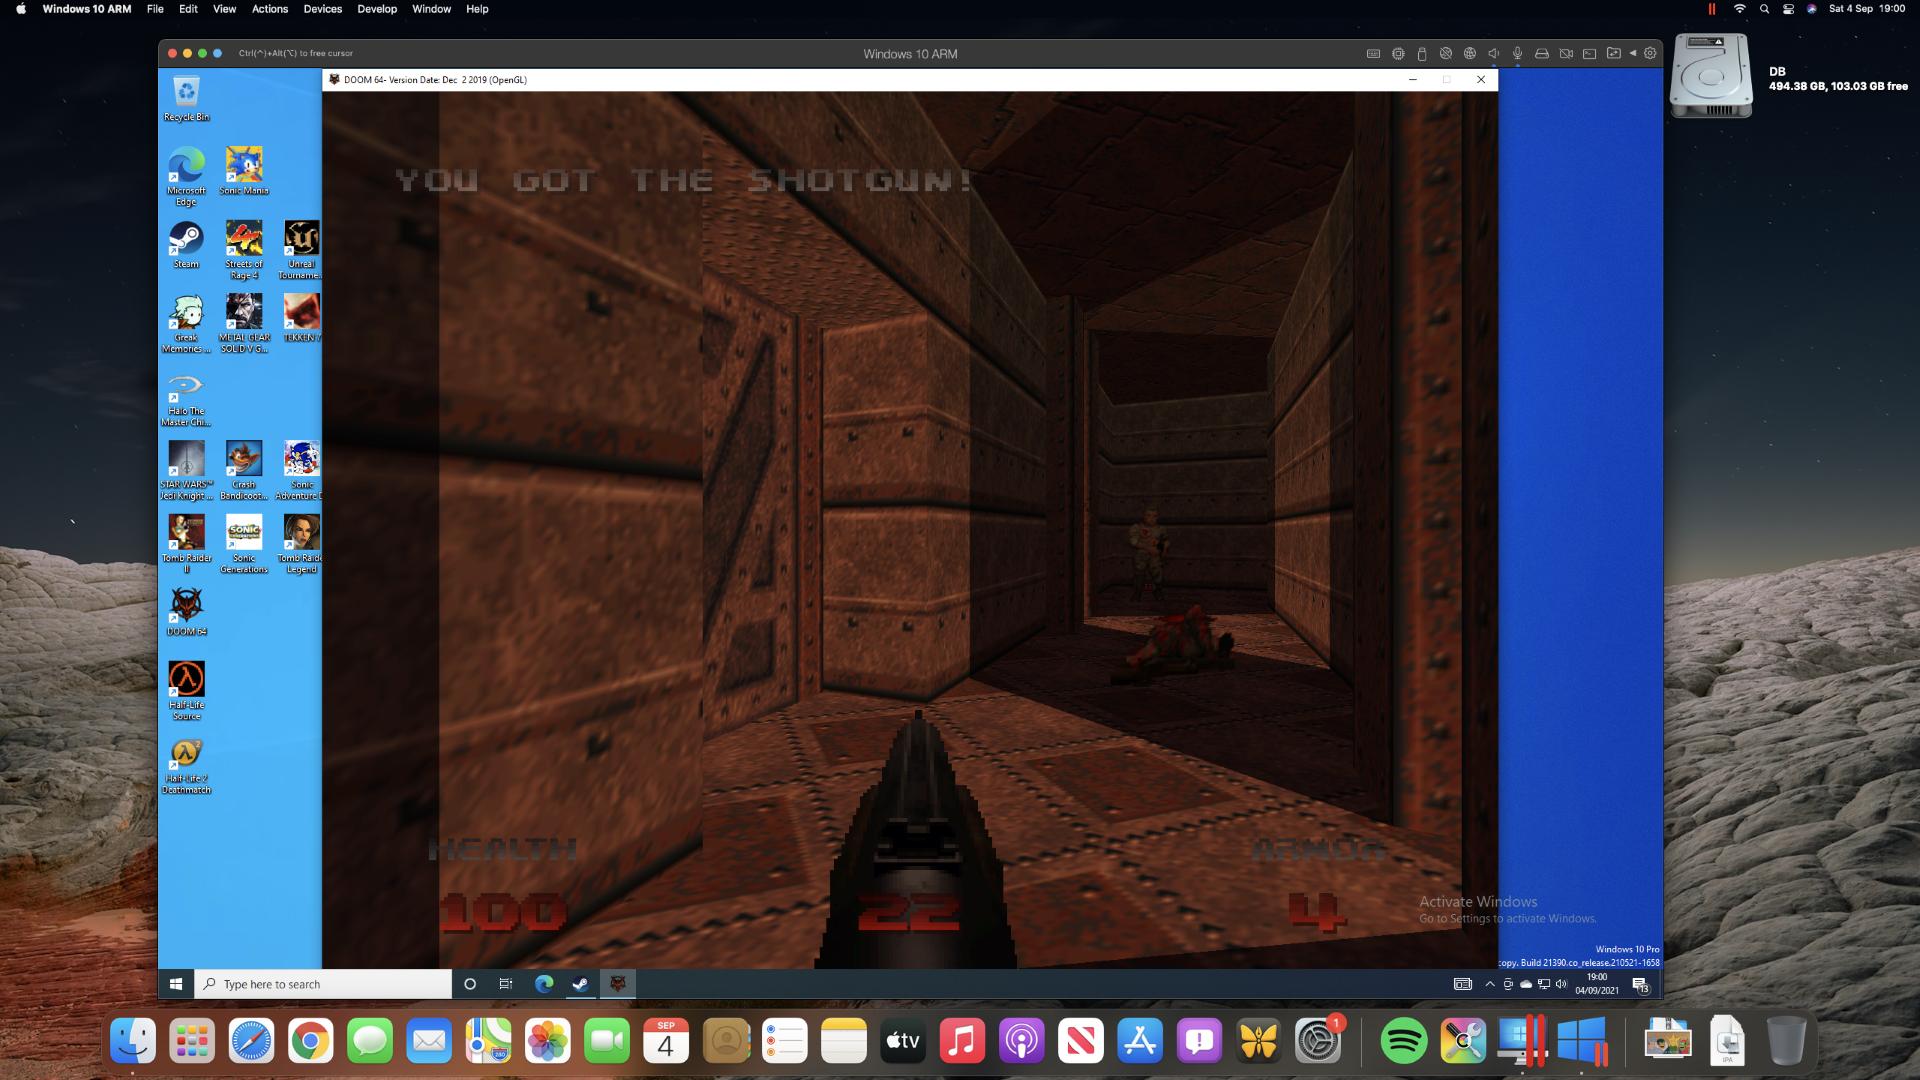 Quake running in Parallels Desktop on a Mac mini M1